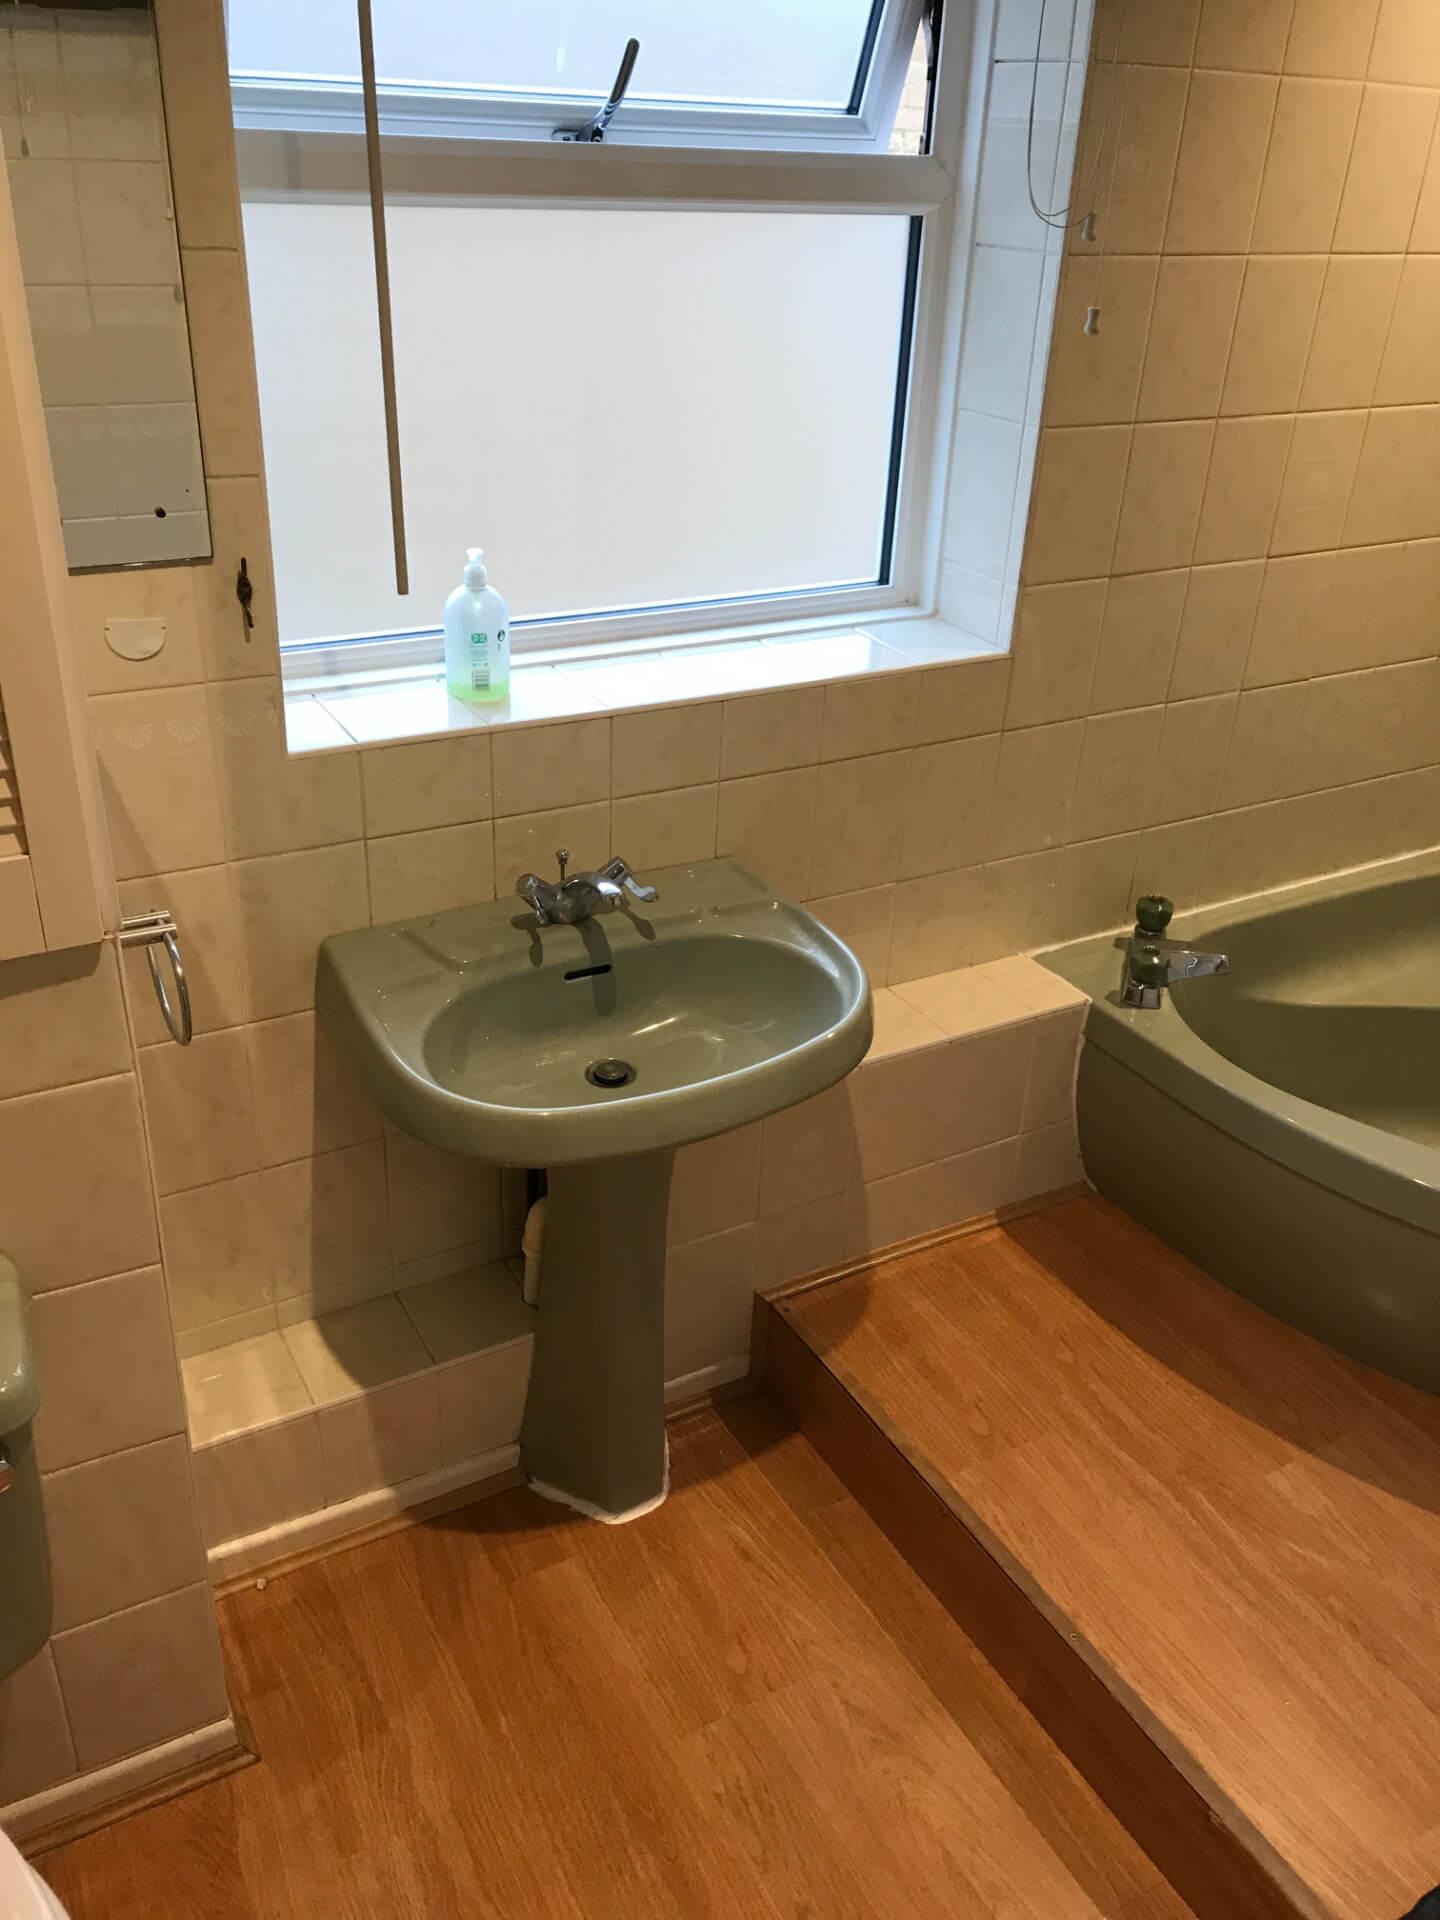 Old Mint Green Sink Unit